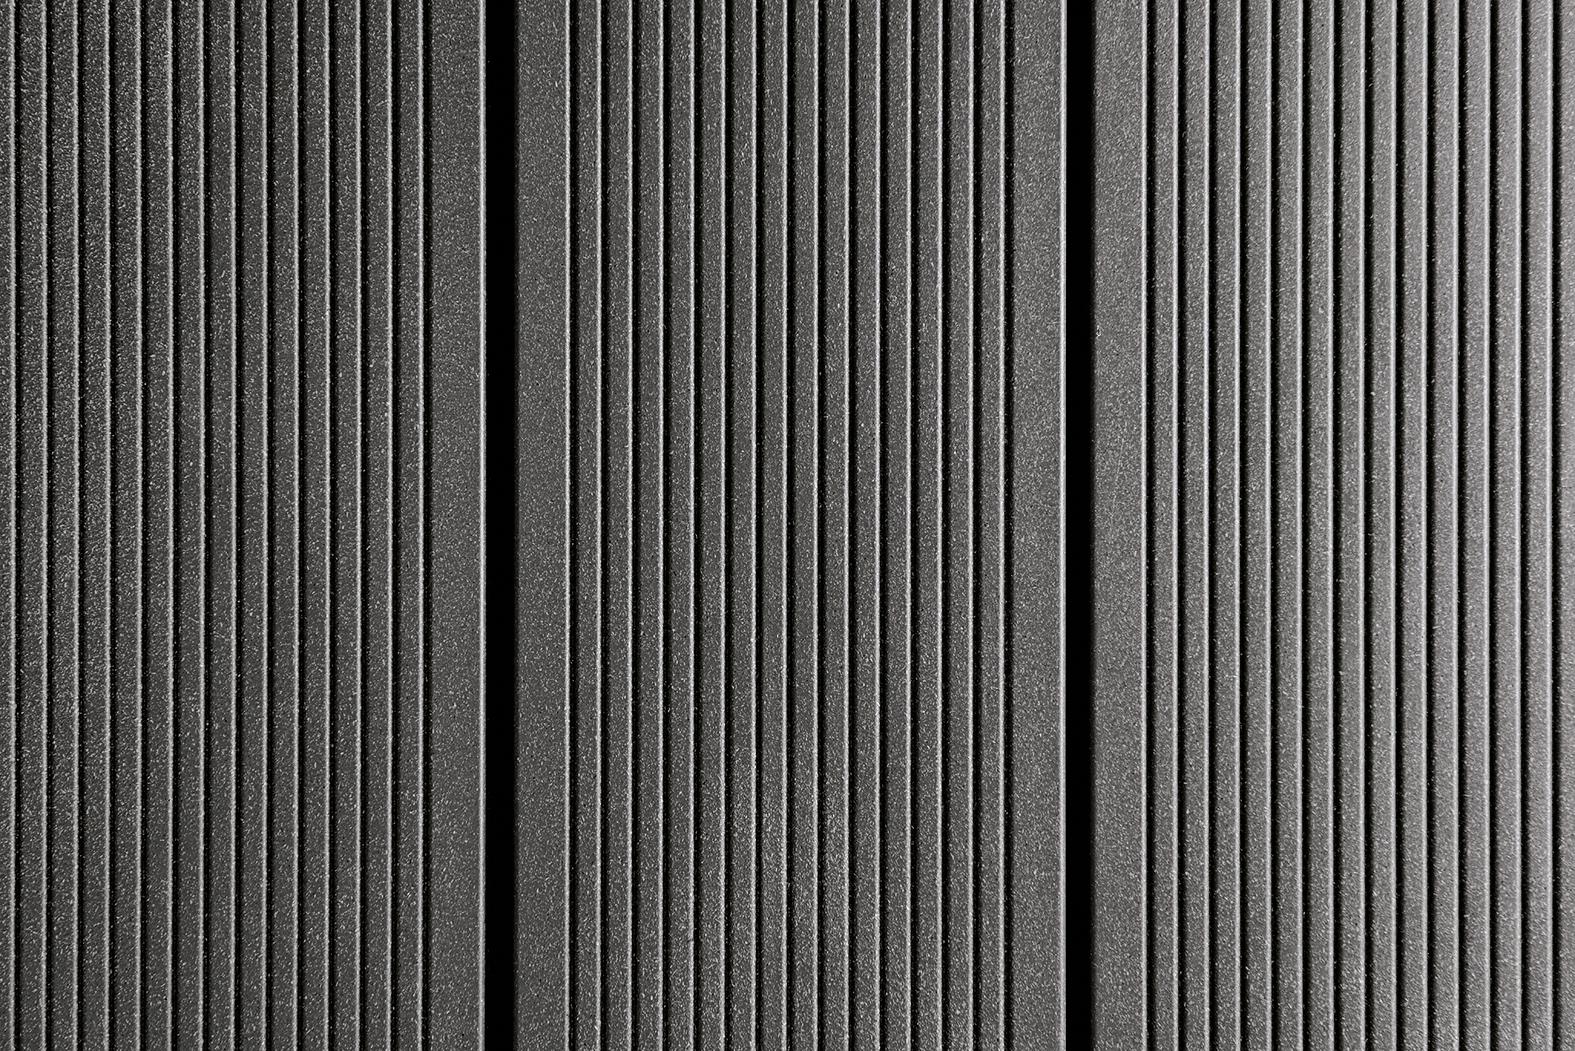 DIE KERNIGE WPC solid plank Anthrazit